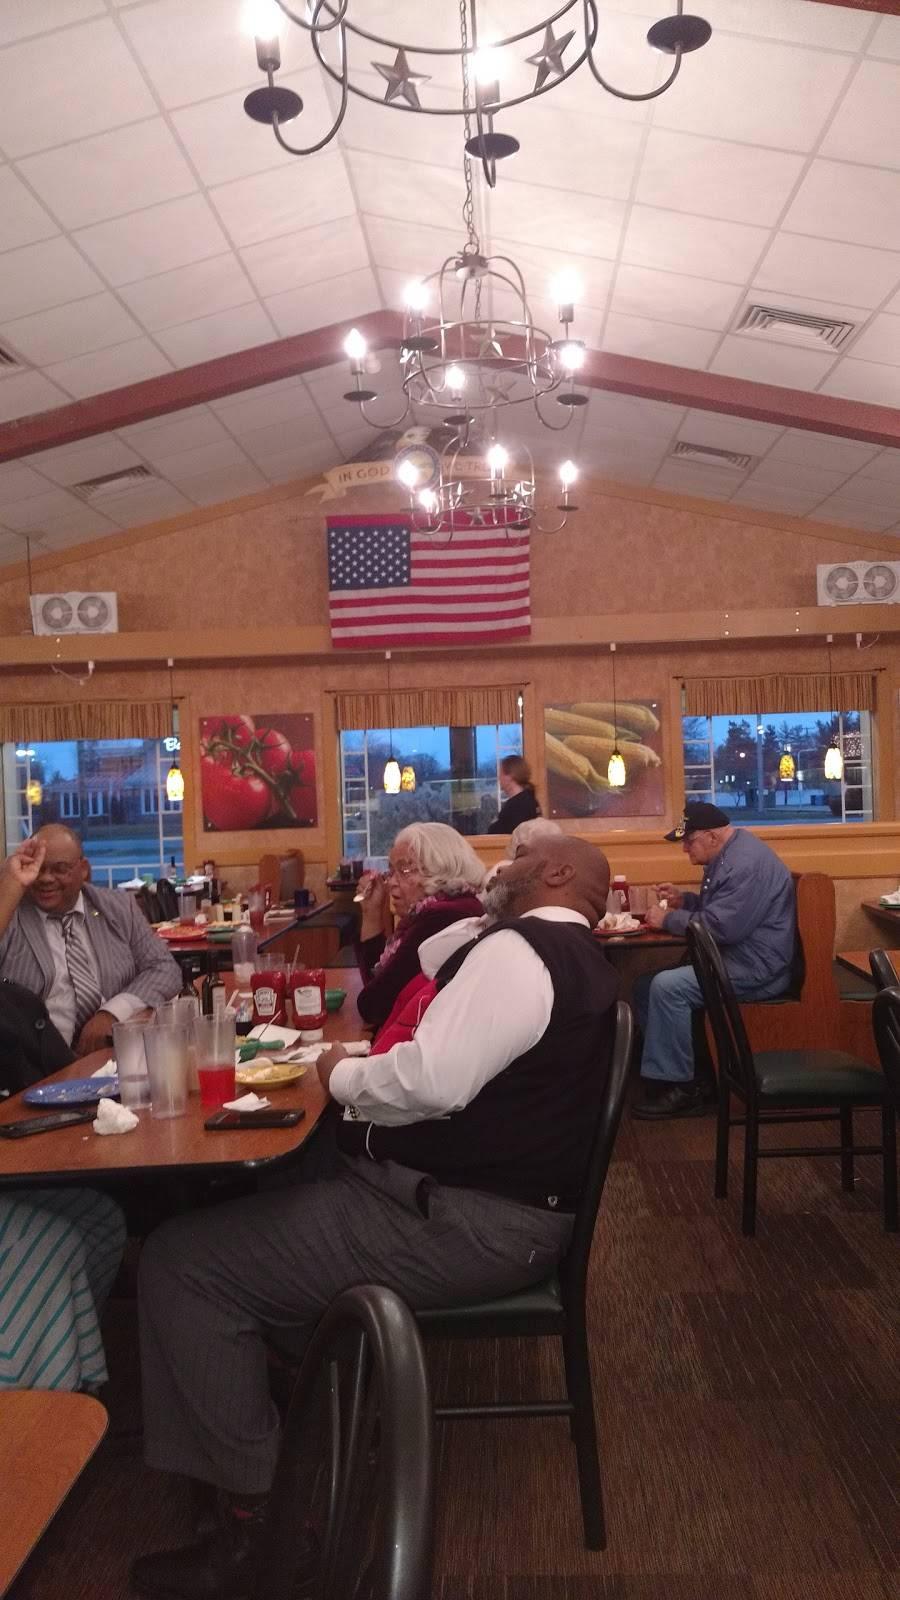 Ponderosa - restaurant  | Photo 6 of 8 | Address: 3875 S High St, Columbus, OH 43207, USA | Phone: (614) 491-7552